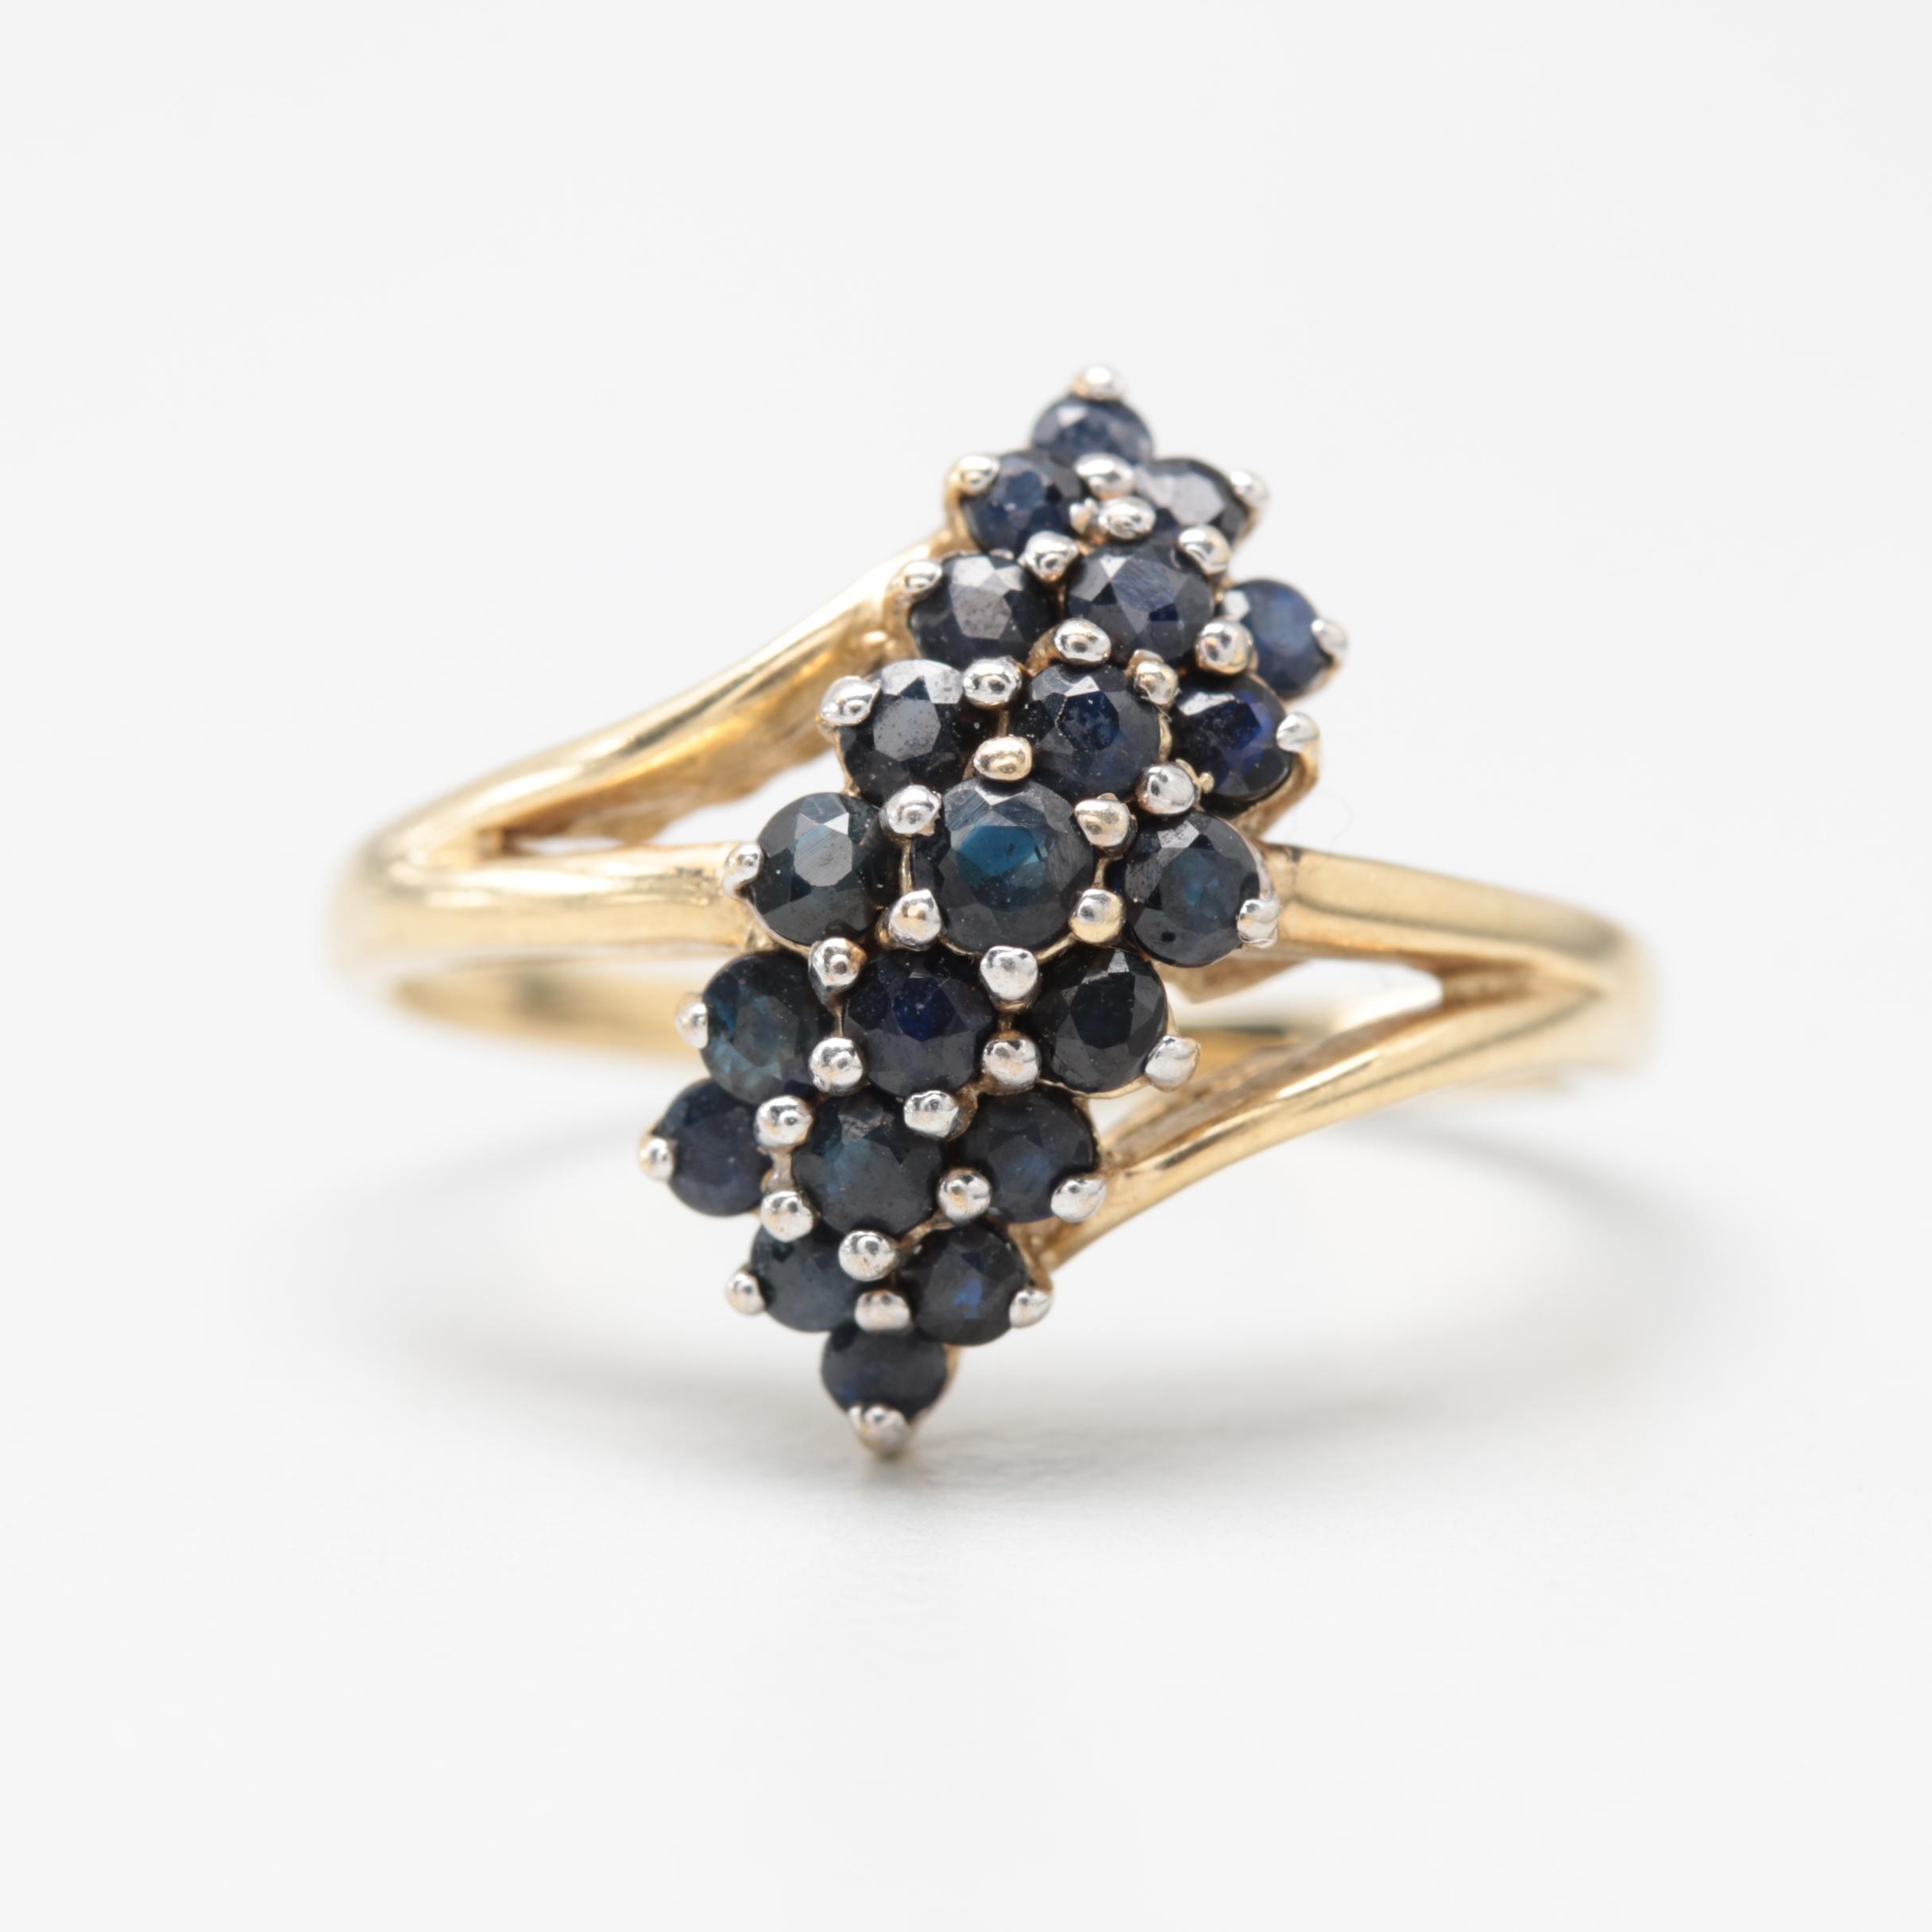 10K Yellow Gold Blue Sapphire Ring